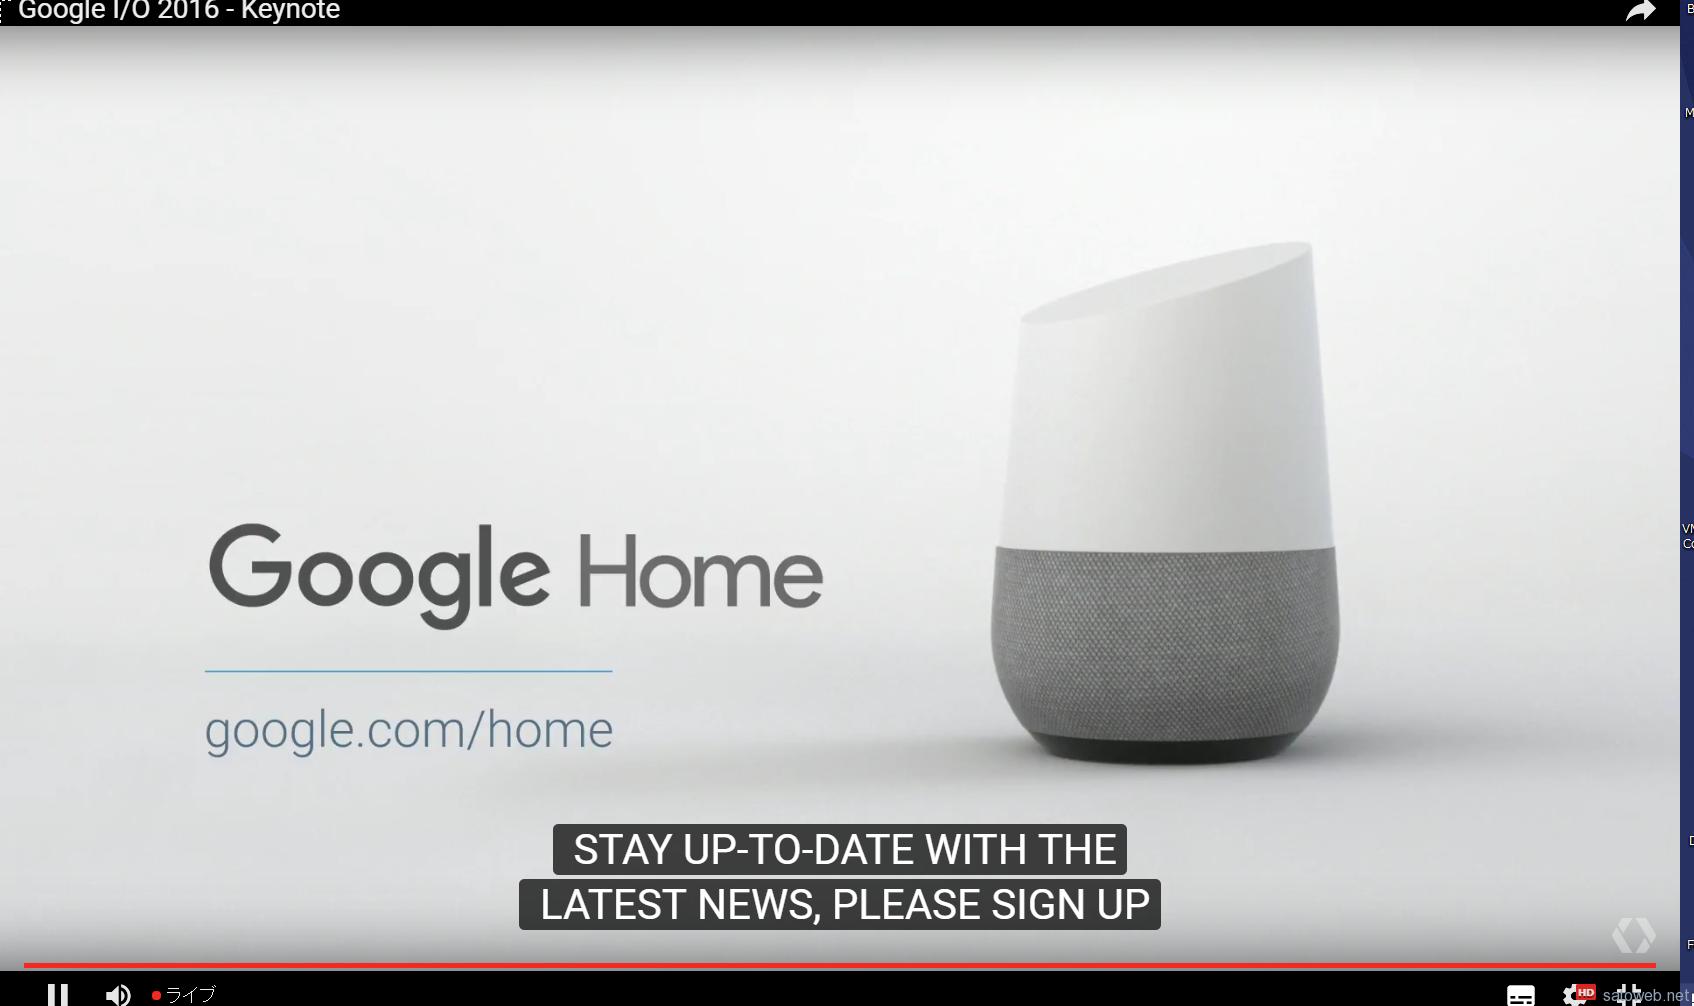 GoogleI/O斜め読みメモ「Allo」「GoogleHome」「AndroidN」